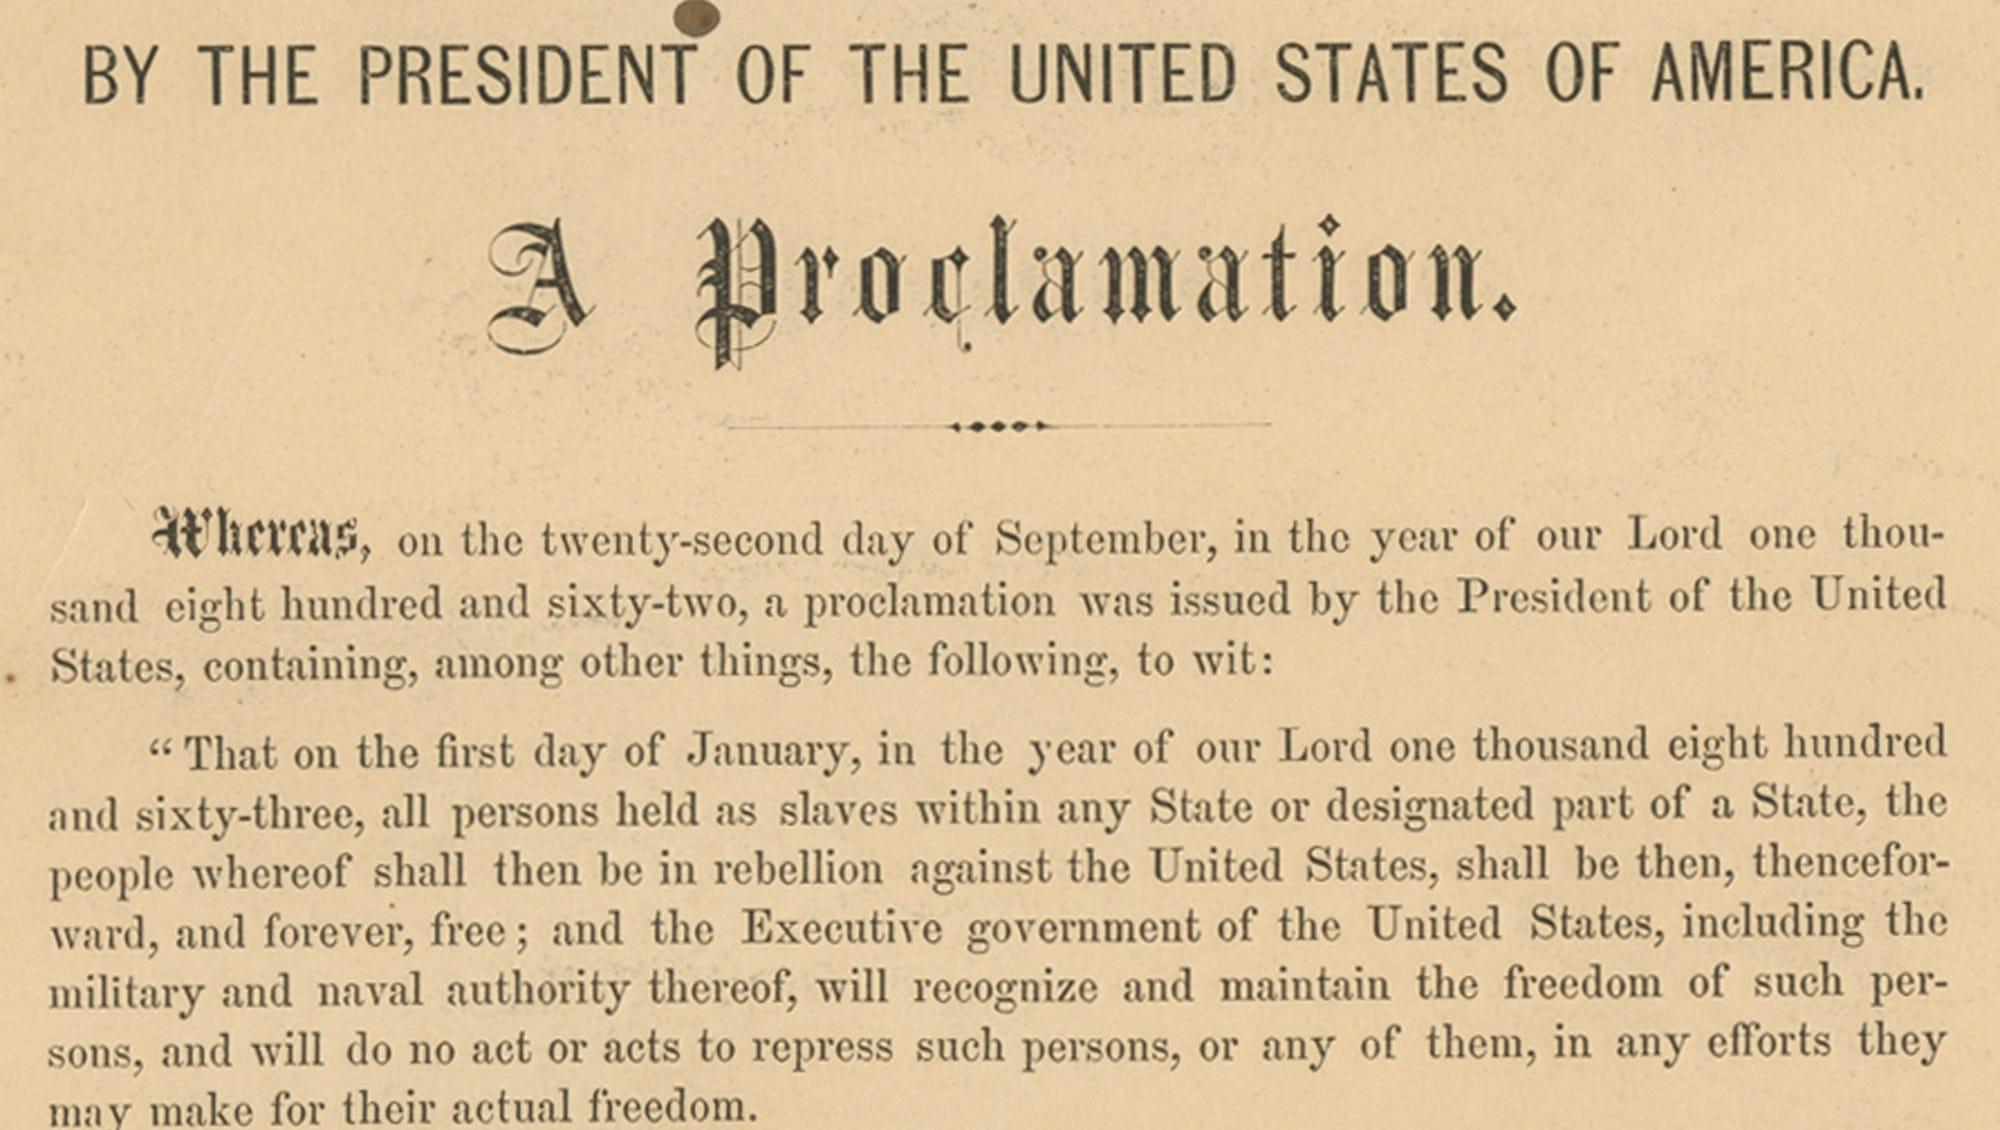 emancipation proclamation meaning